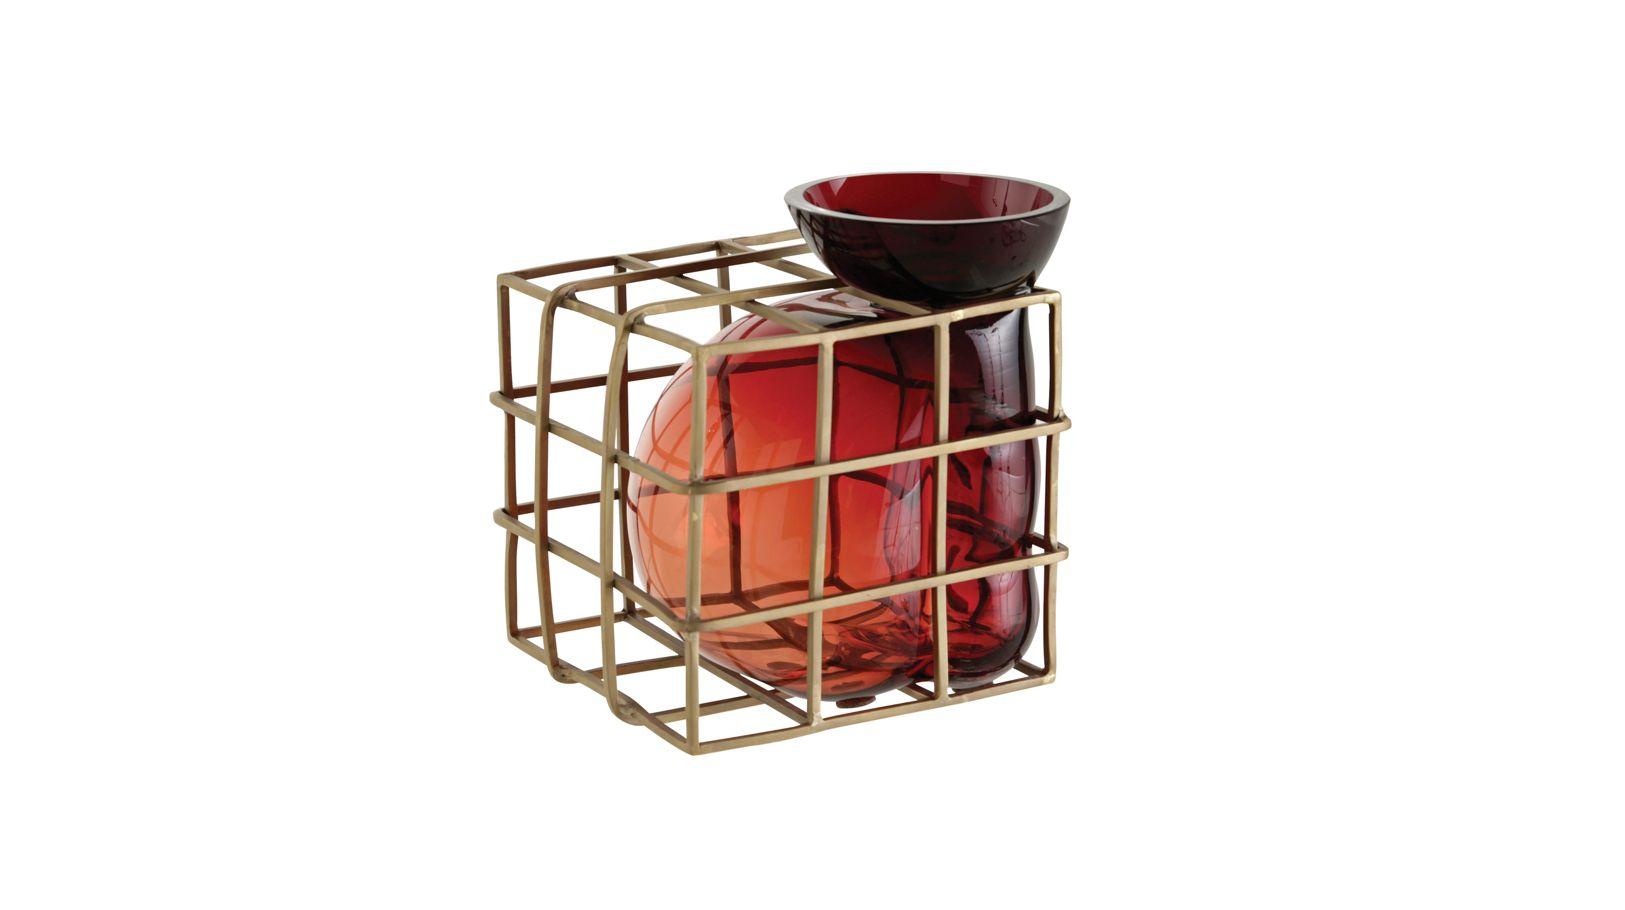 Trapped Vase Roche Bobois